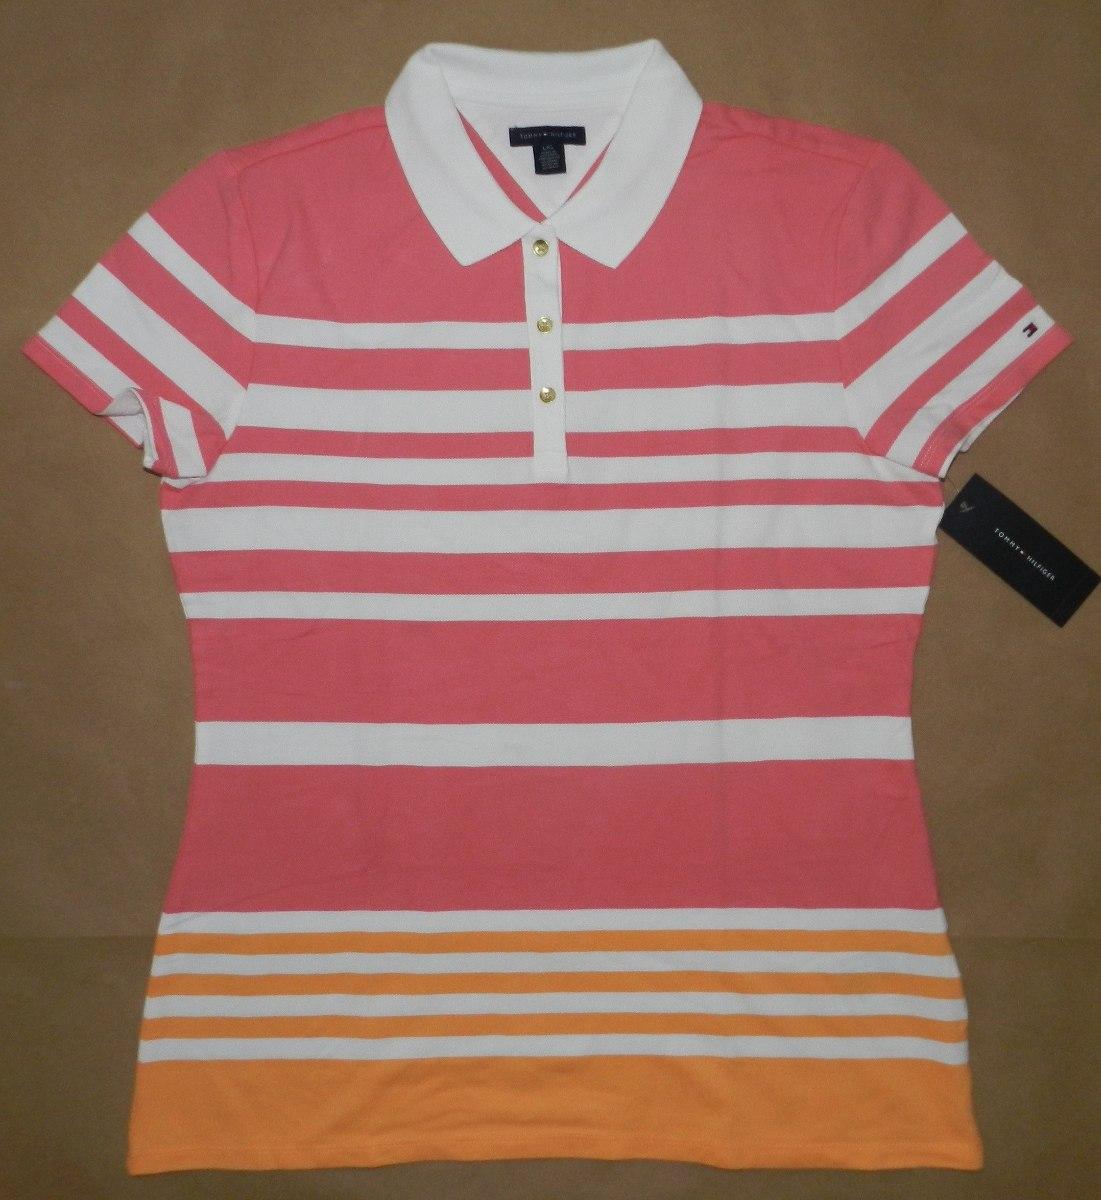 camisa gola polo feminina tommy hilfiger - tamanho g. Carregando zoom. ac1a4b62120db